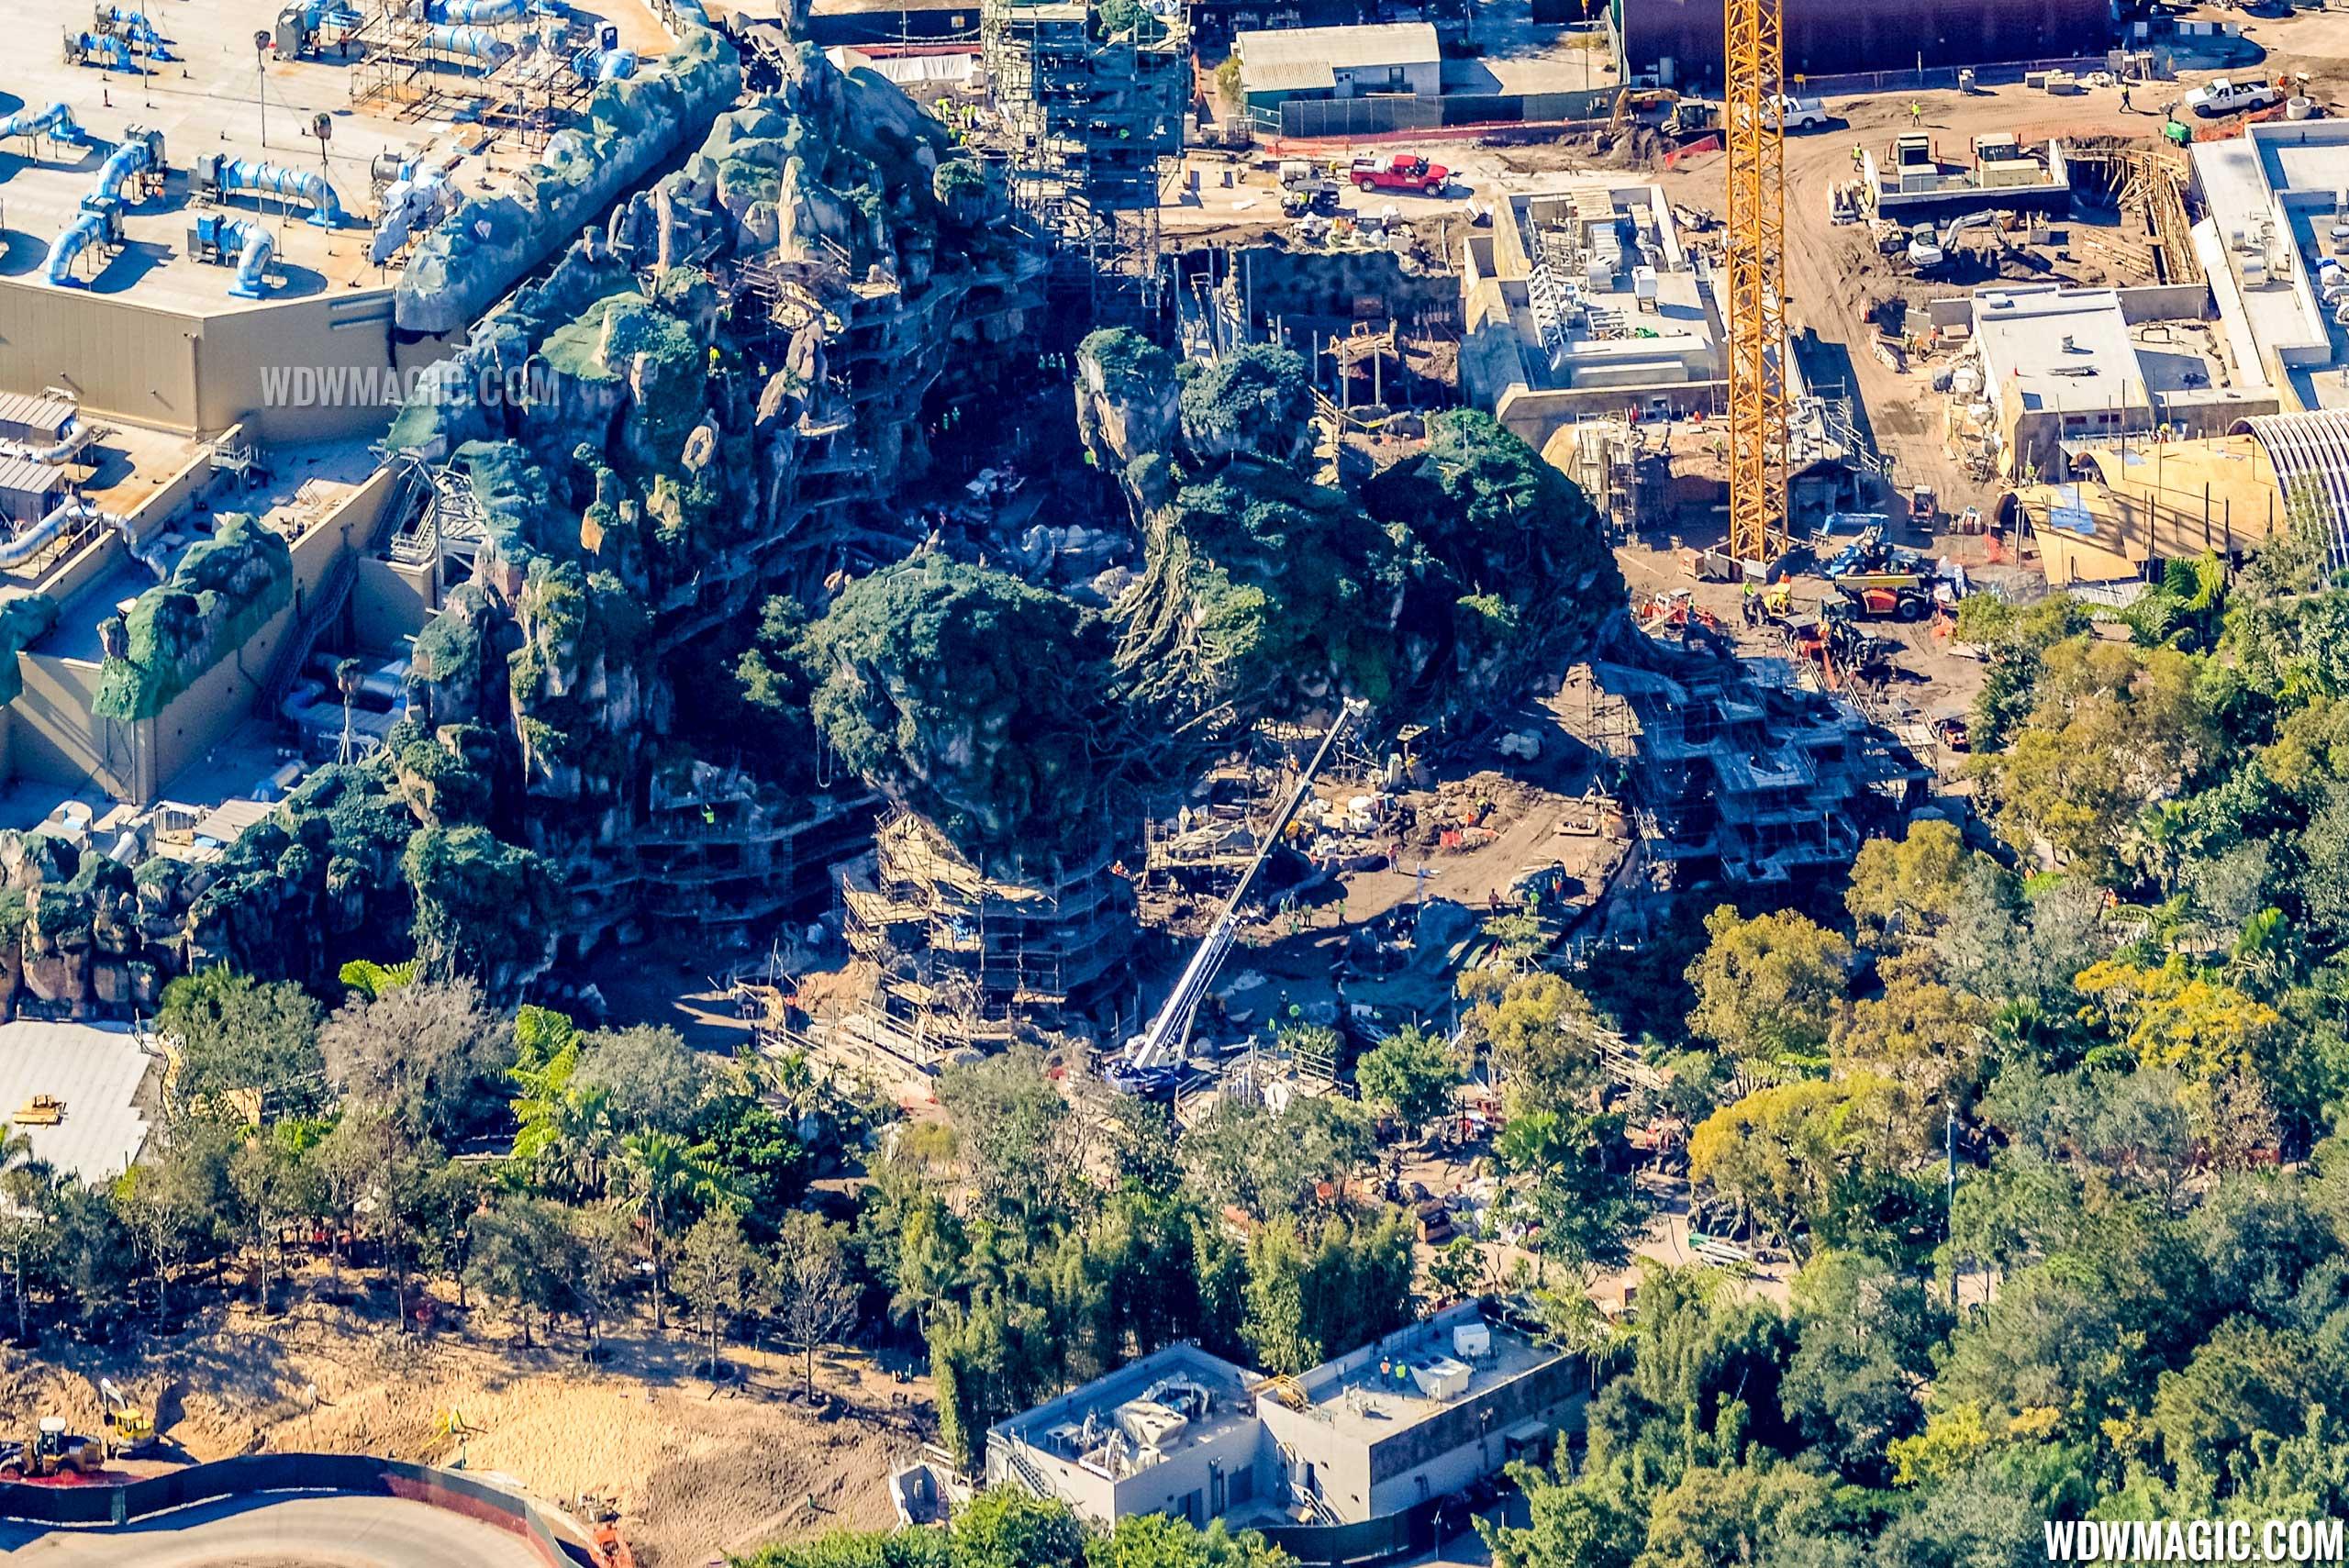 Photo by CJ Berzin @BerzinPhotography. 'Pandora - The World of Avatar' aerial view.